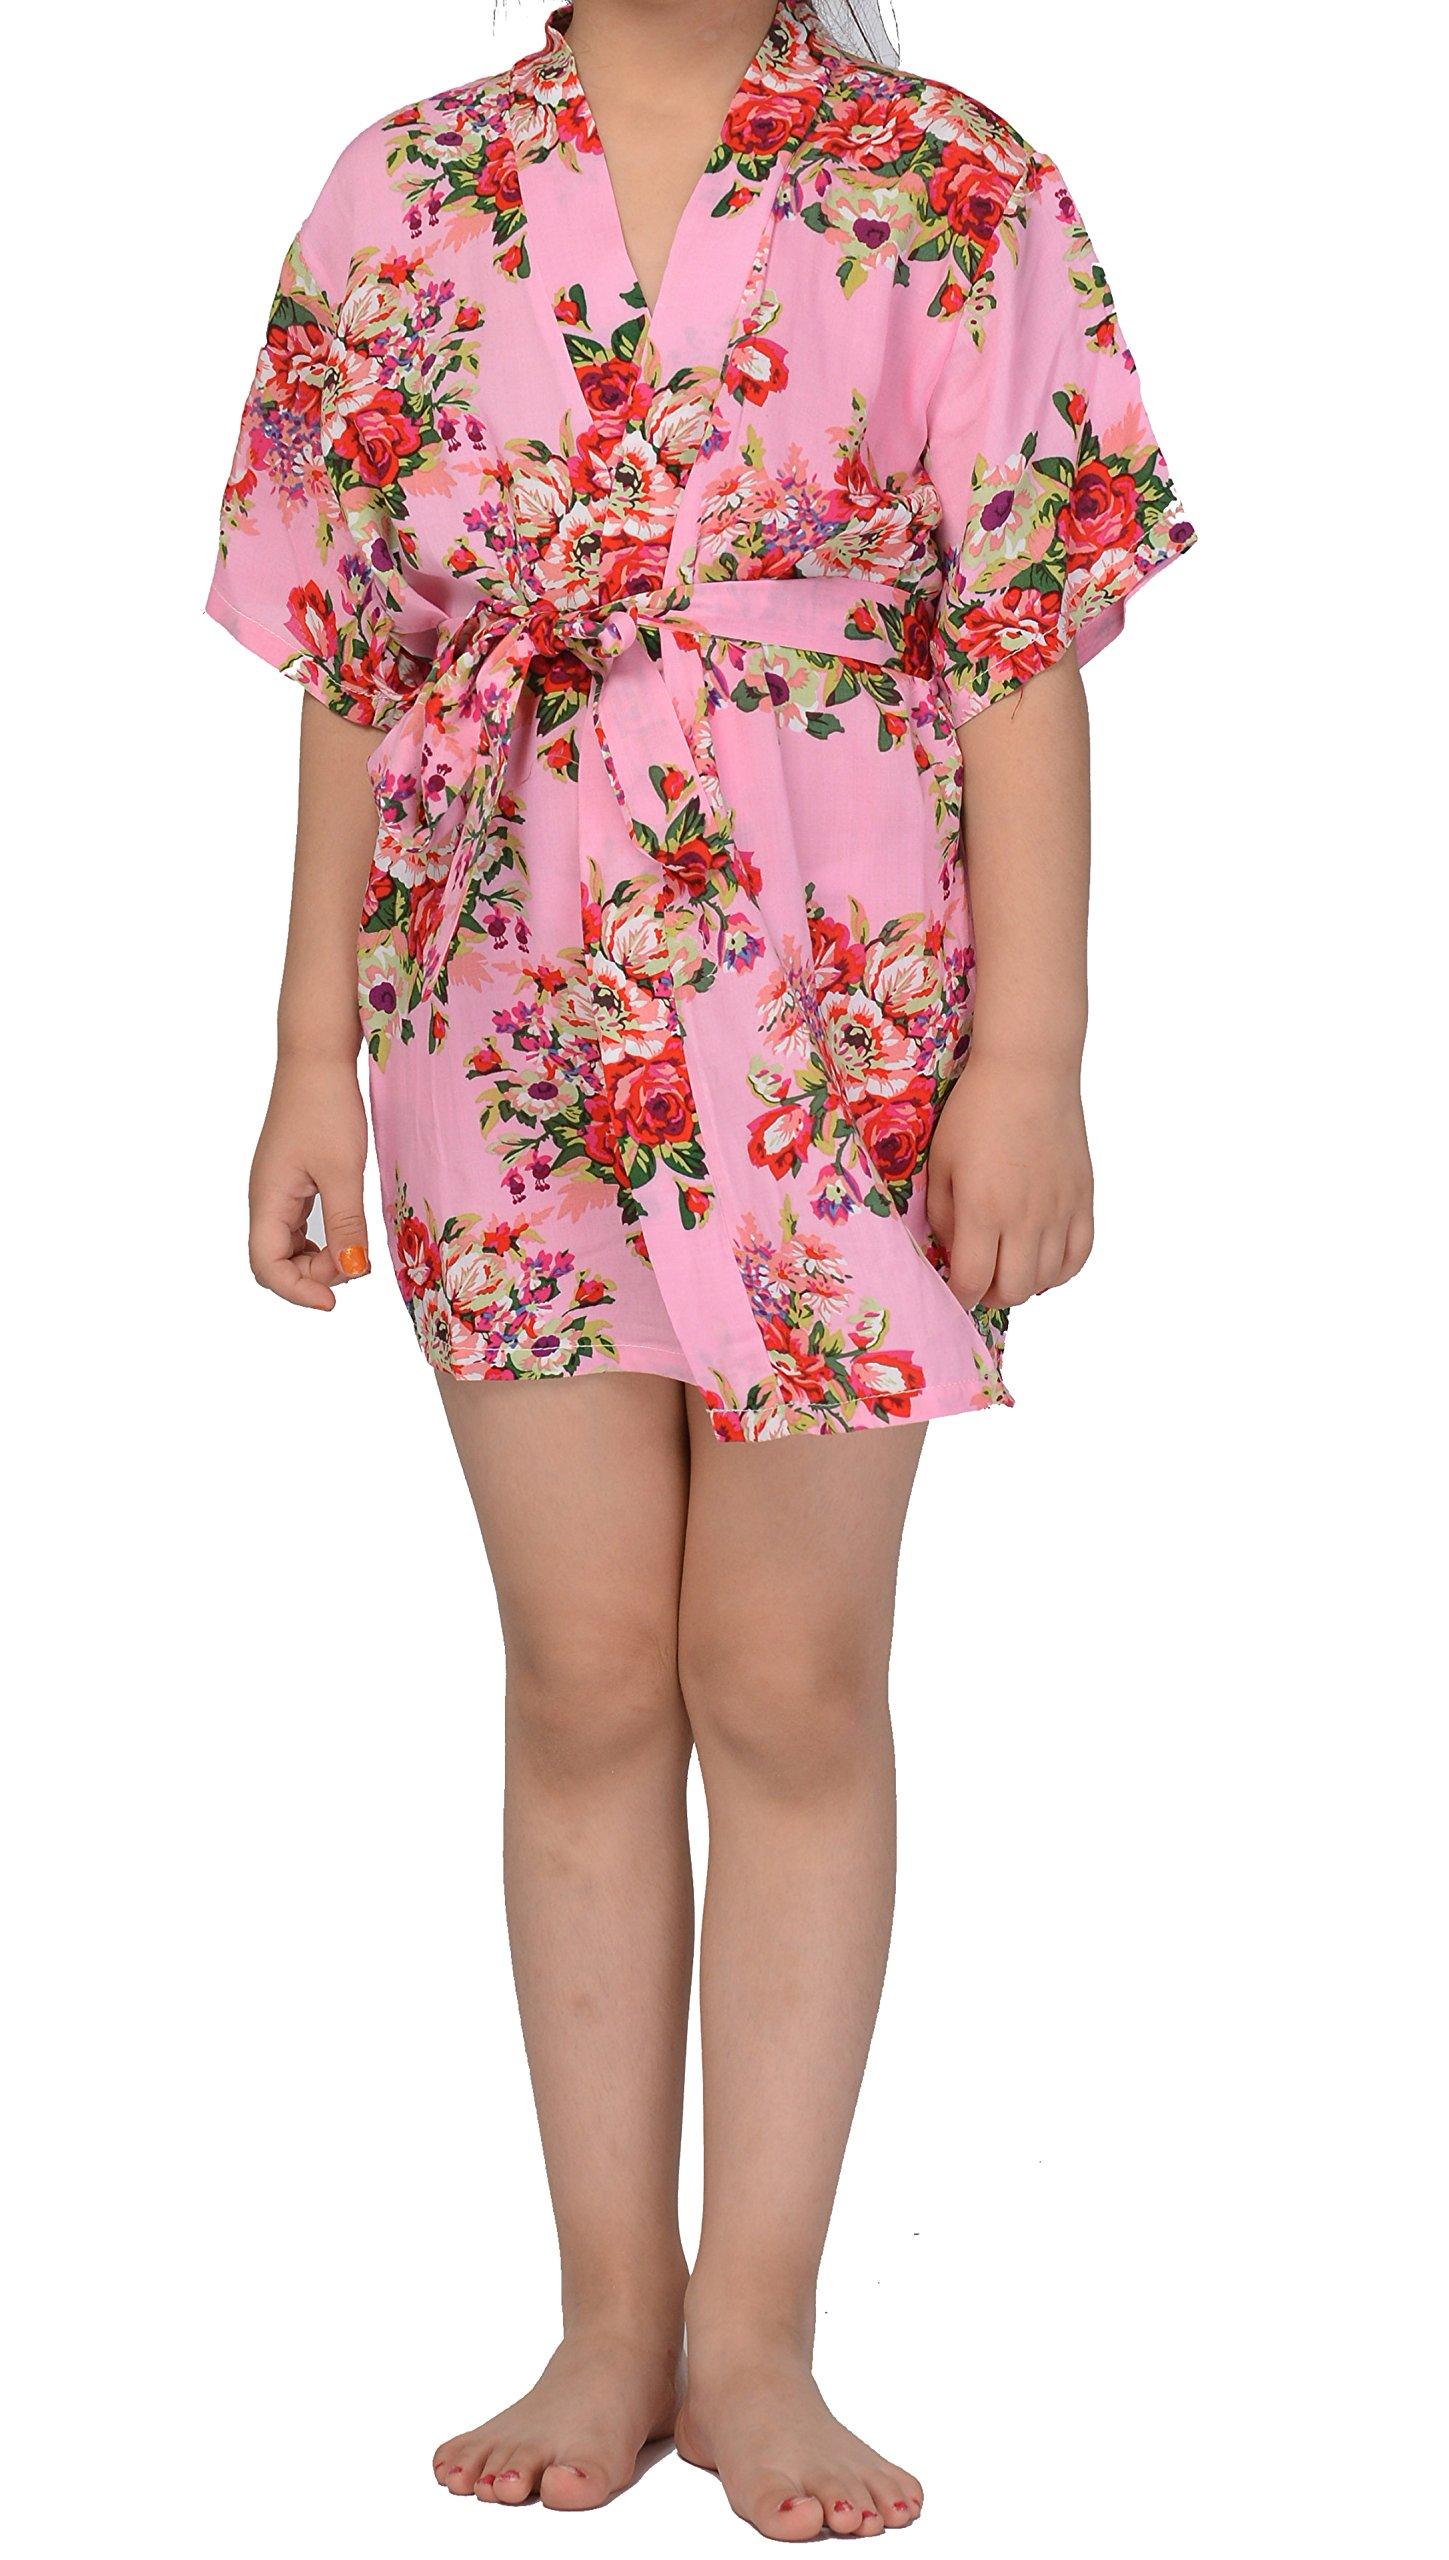 Juntian Girs' Cotton Floral Kimono Robe,Flower Girl and Junior Bridesmaid Getting Ready Robe